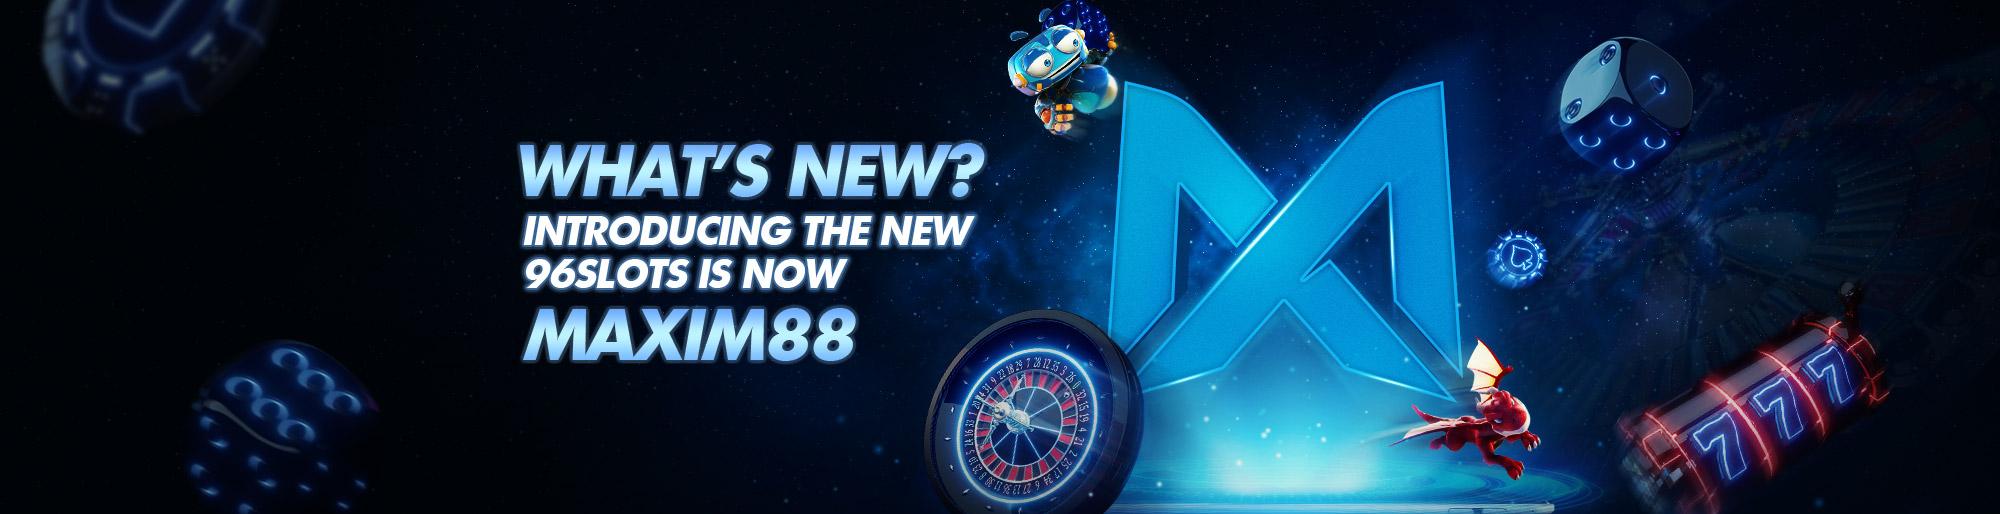 96Slots Rebranding to maxim88